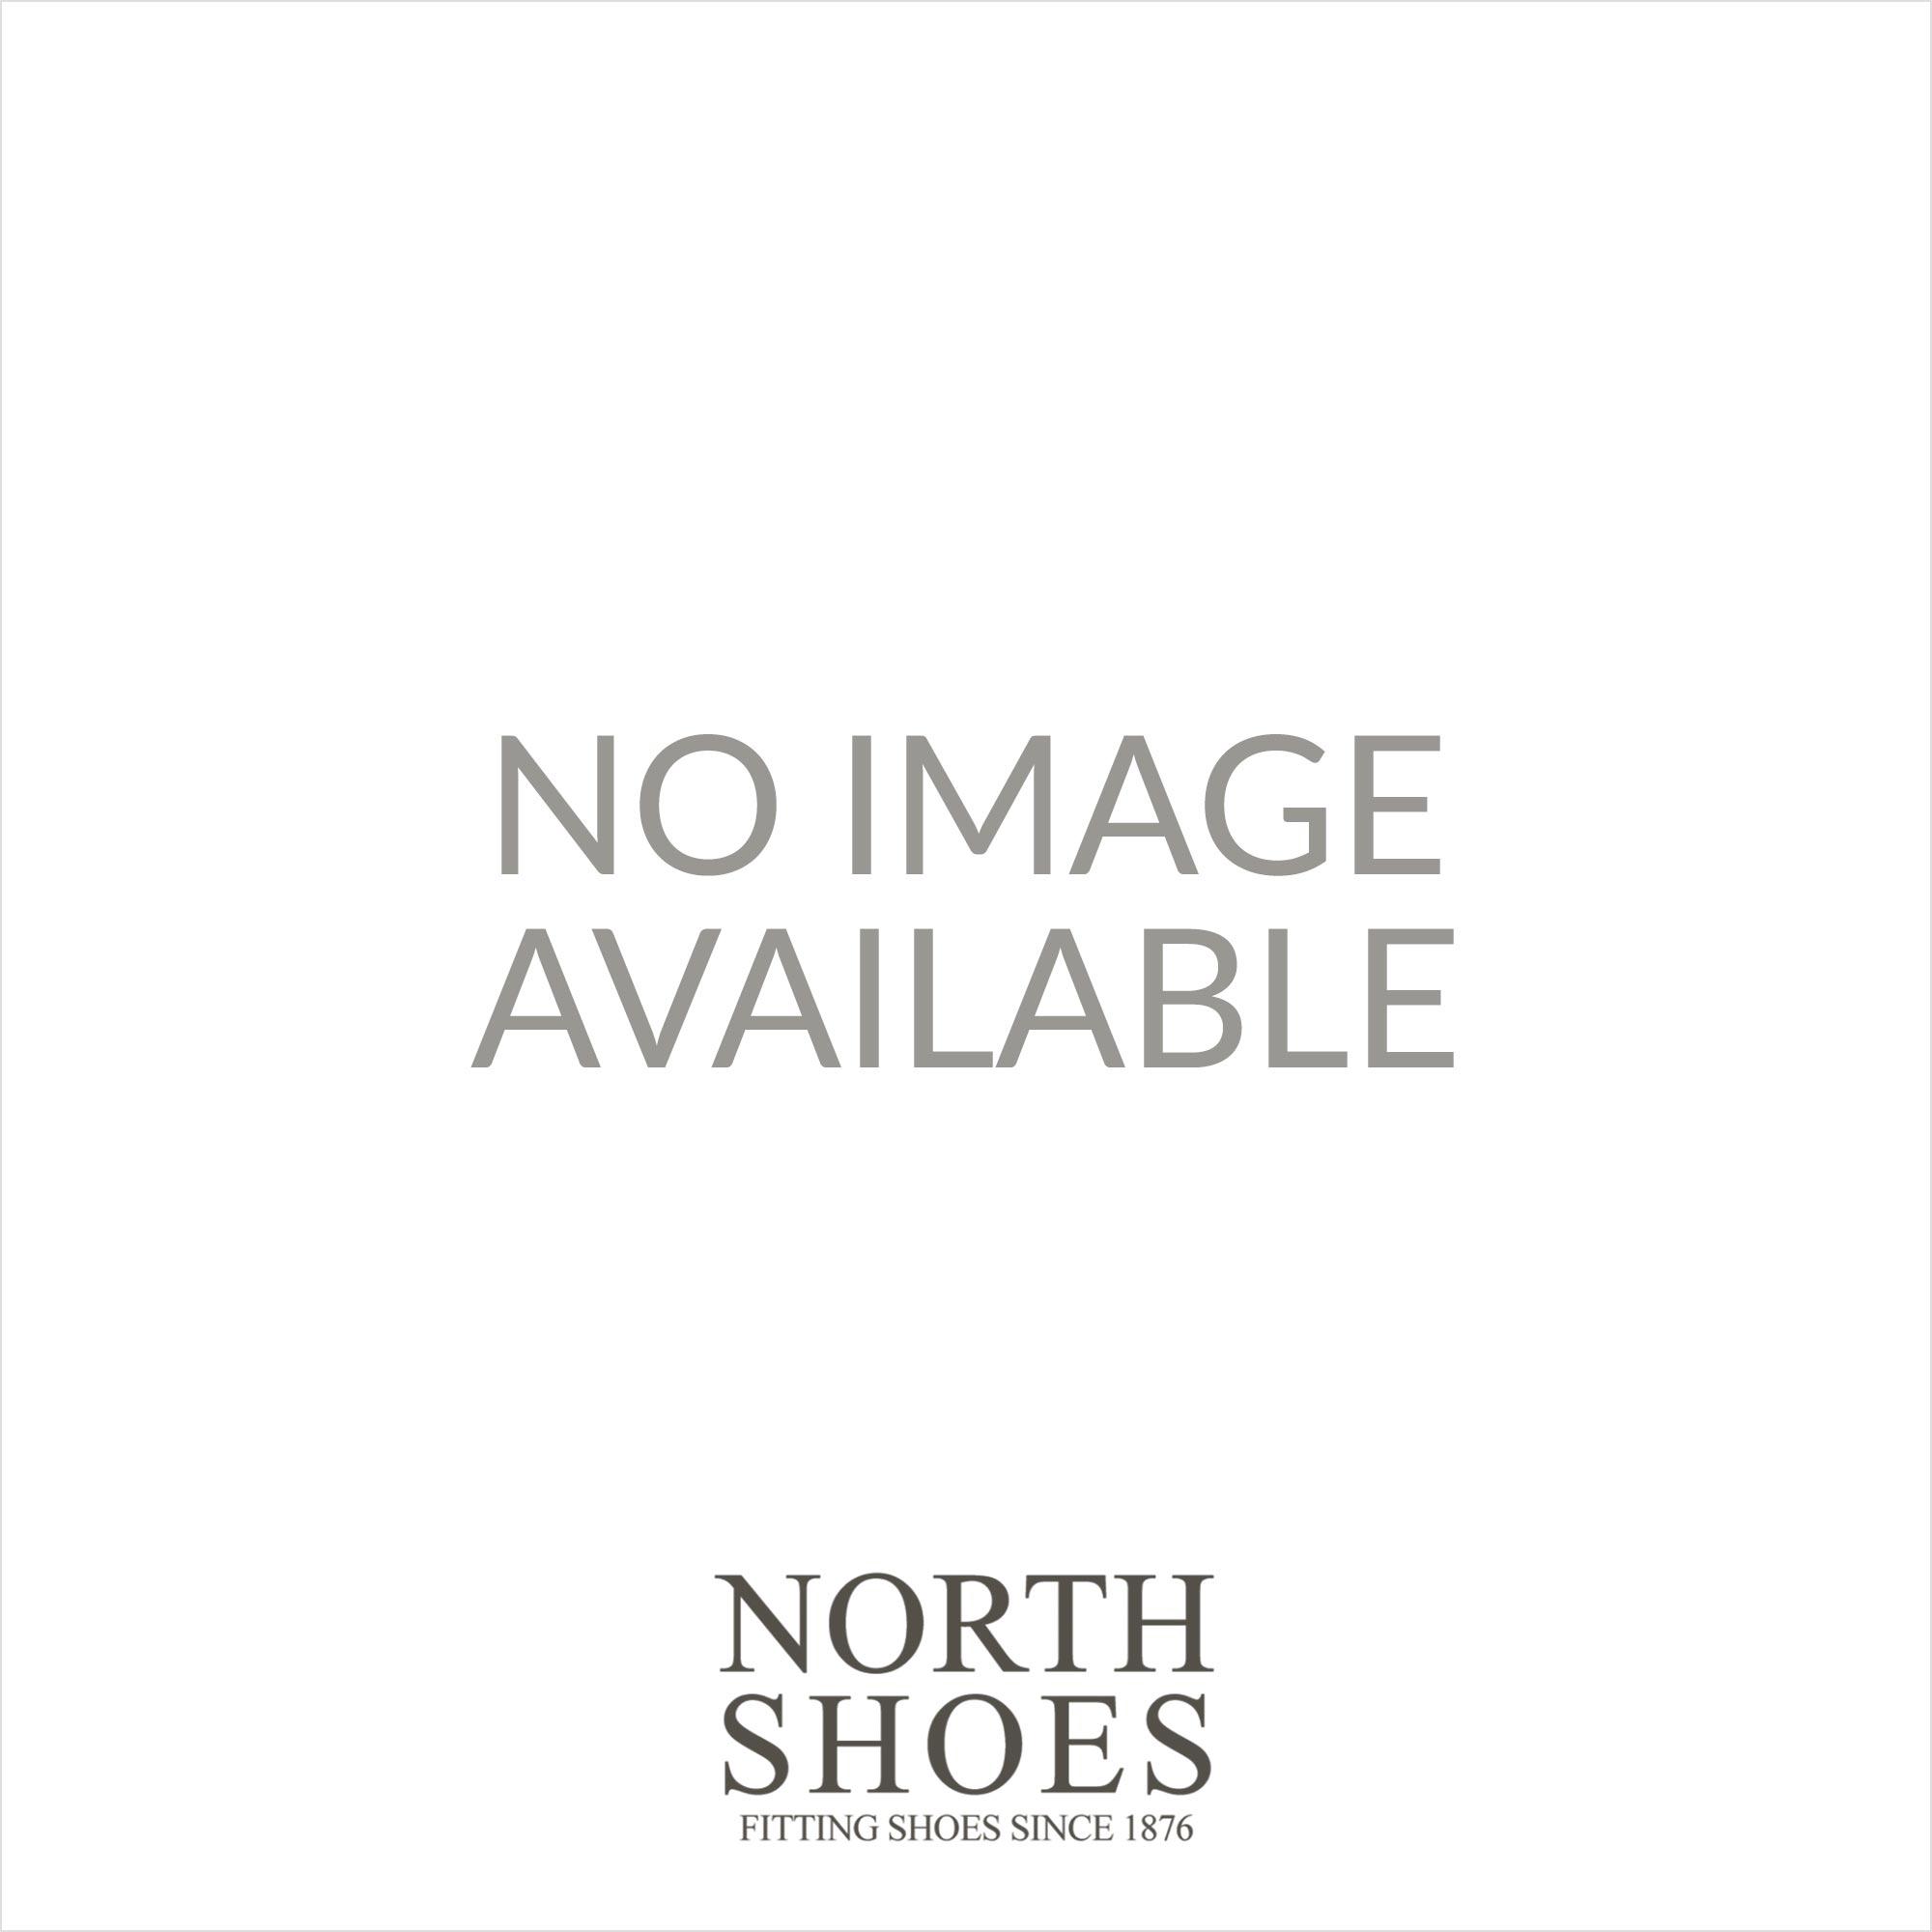 Witcombe Echo Tan Nubuck Leather Womens Chunky Lace Up Brogue Shoe